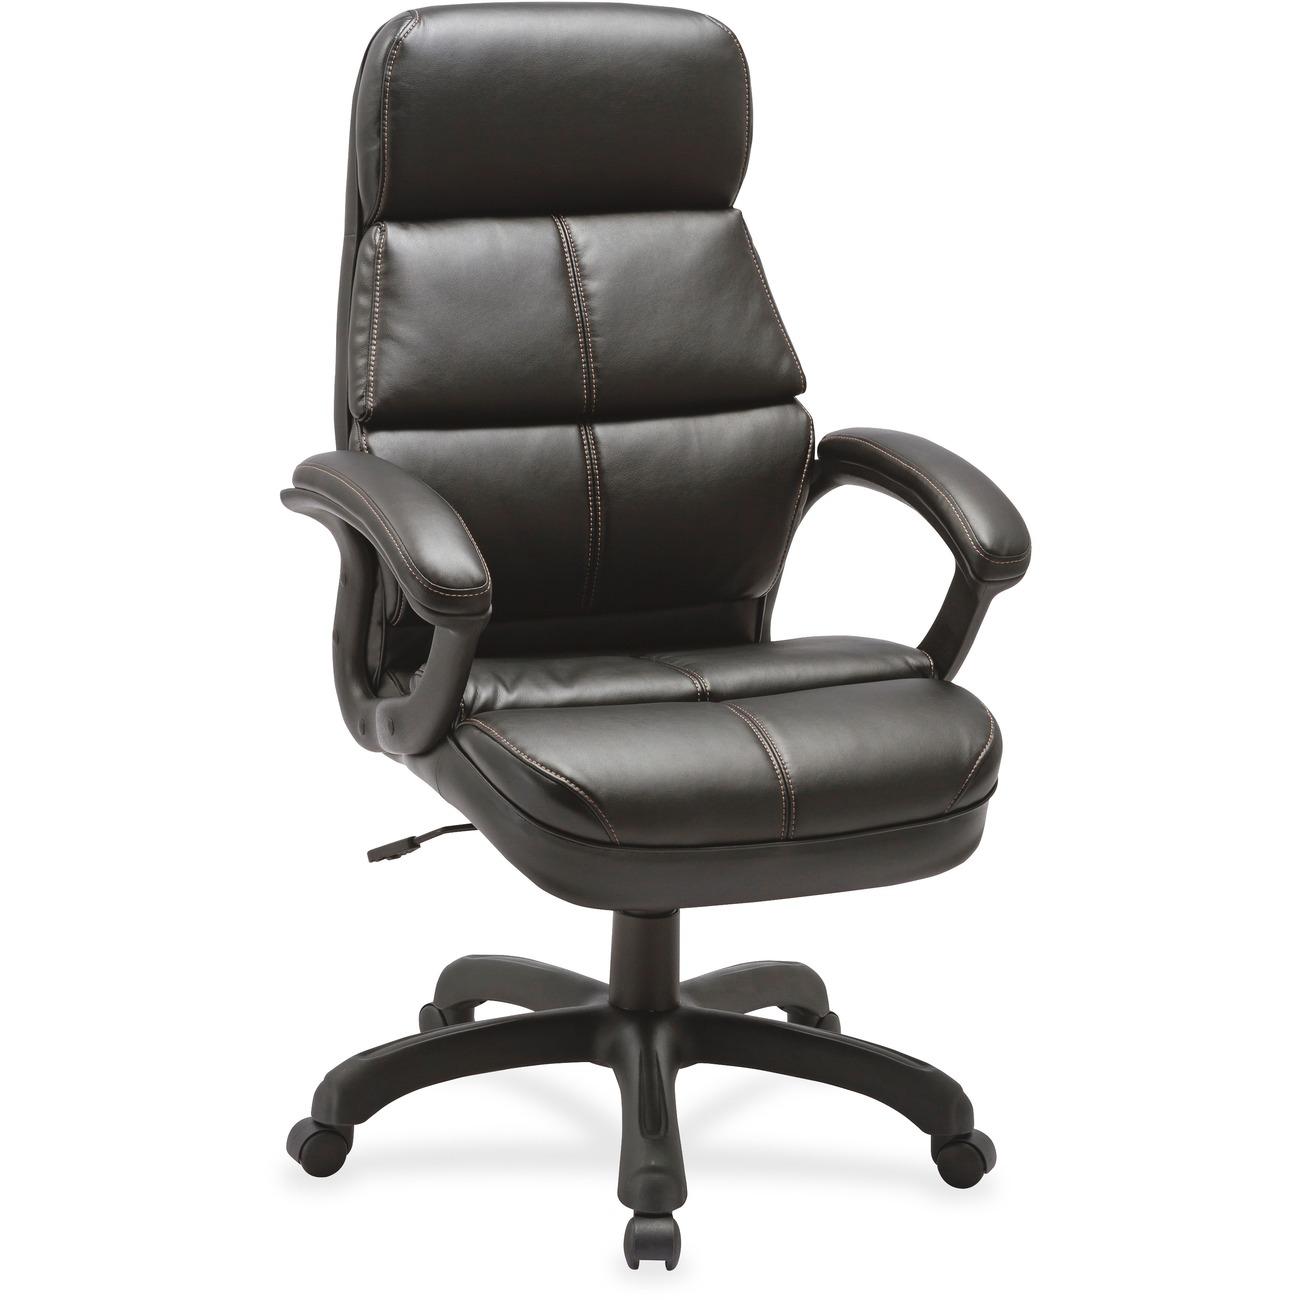 office chair accessories wheelchair ramp for van west coast supplies furniture chairs